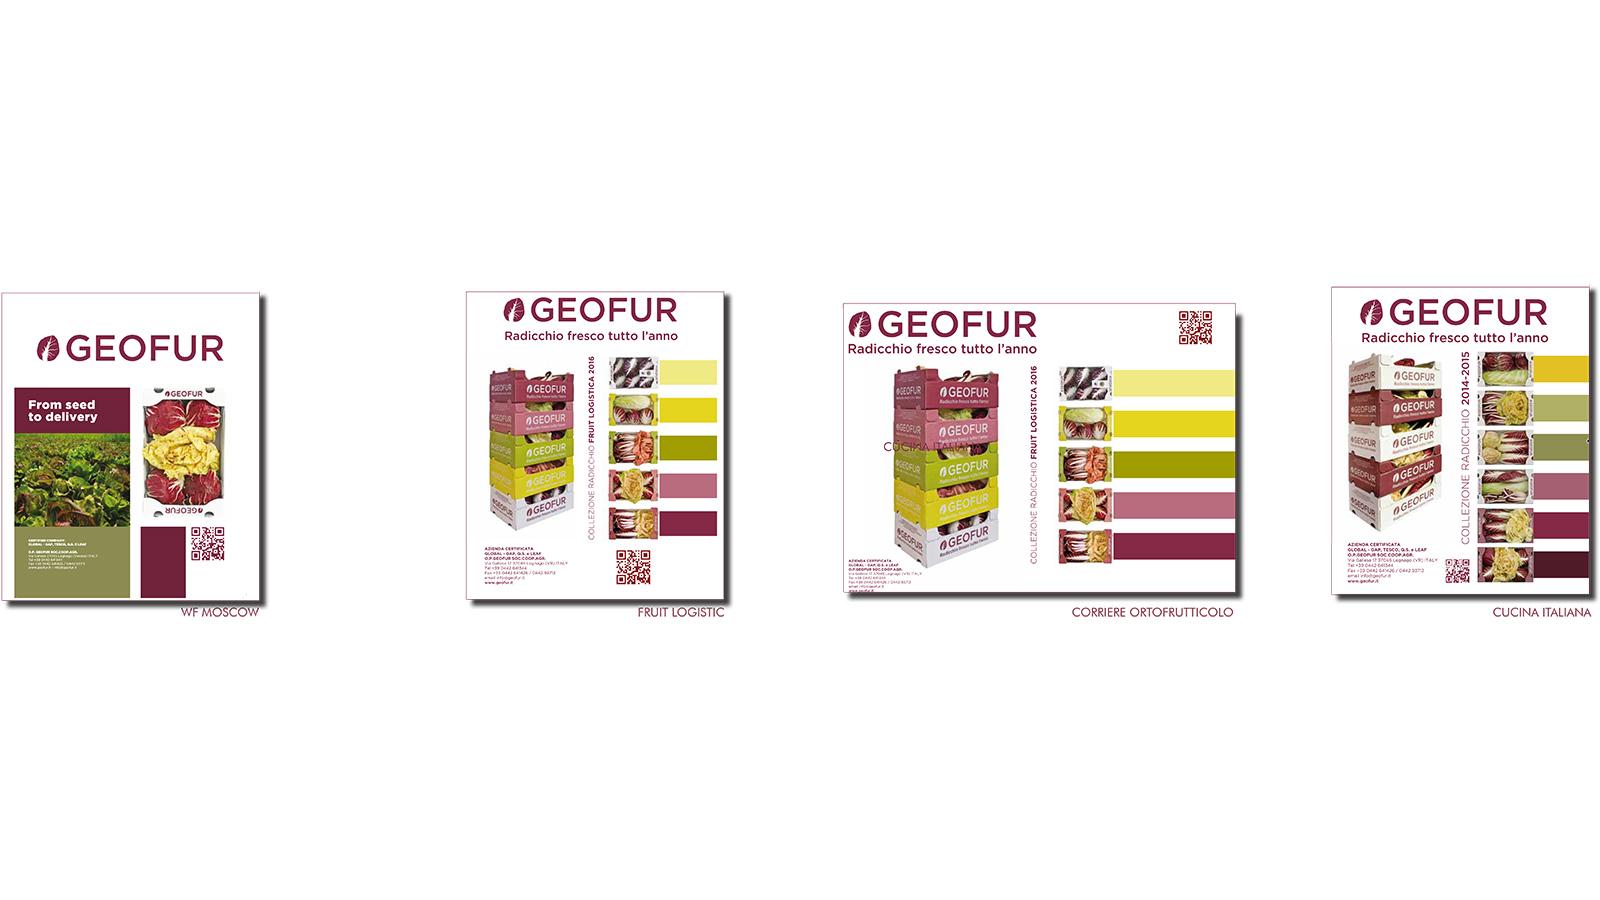 geofur-consulenza-globale-adv